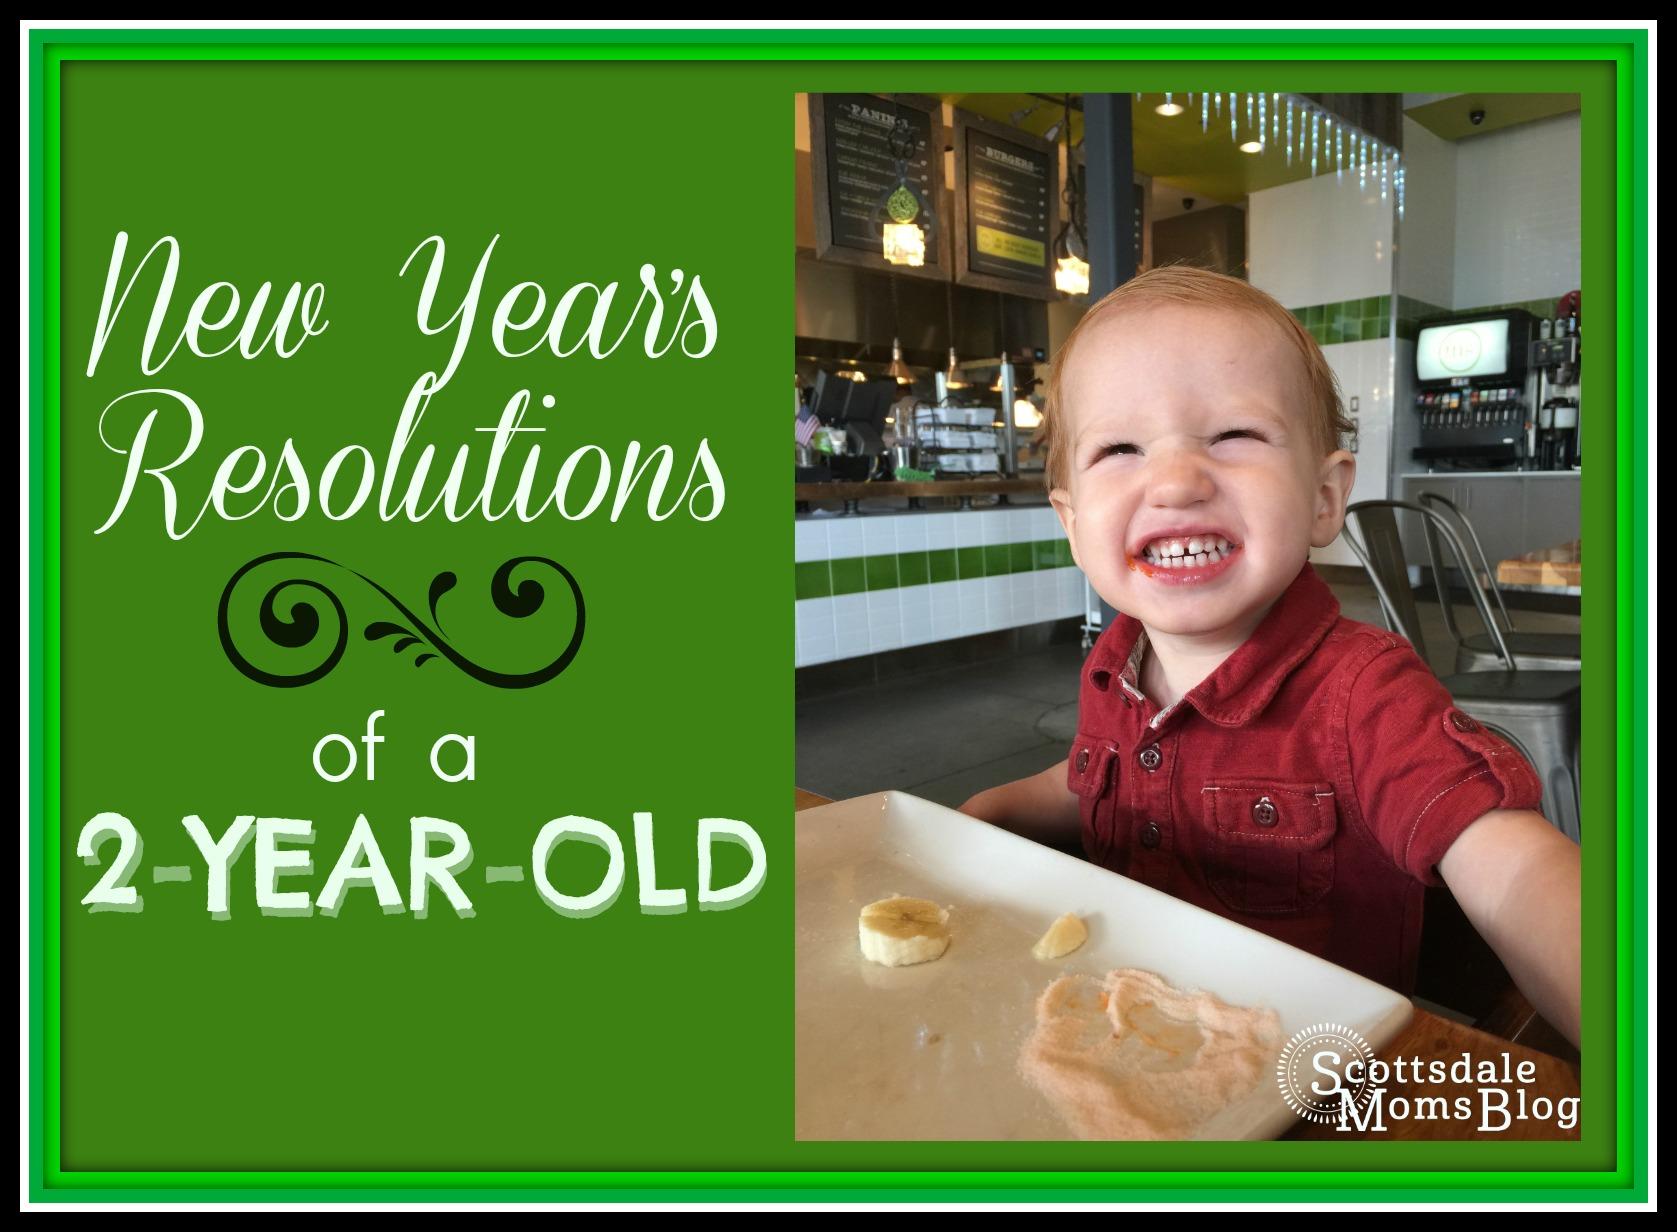 2-yr resolutions